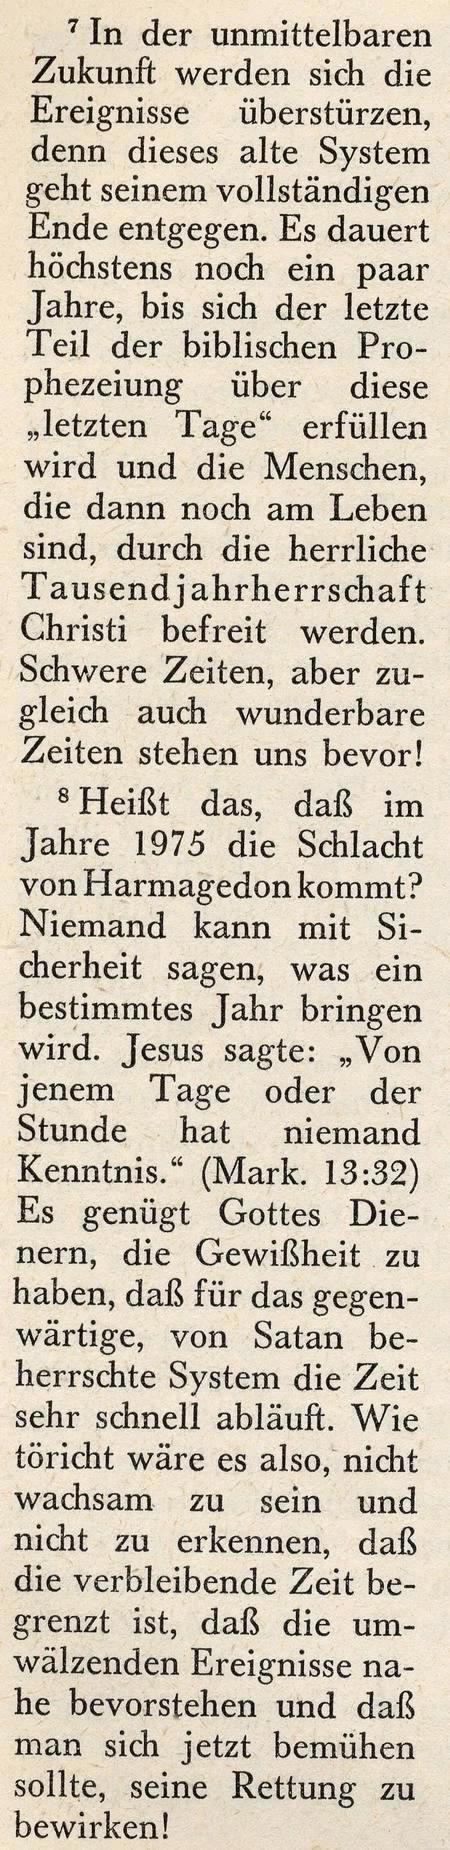 http://www.manfred-gebhard.de/1968WT18464.jpg